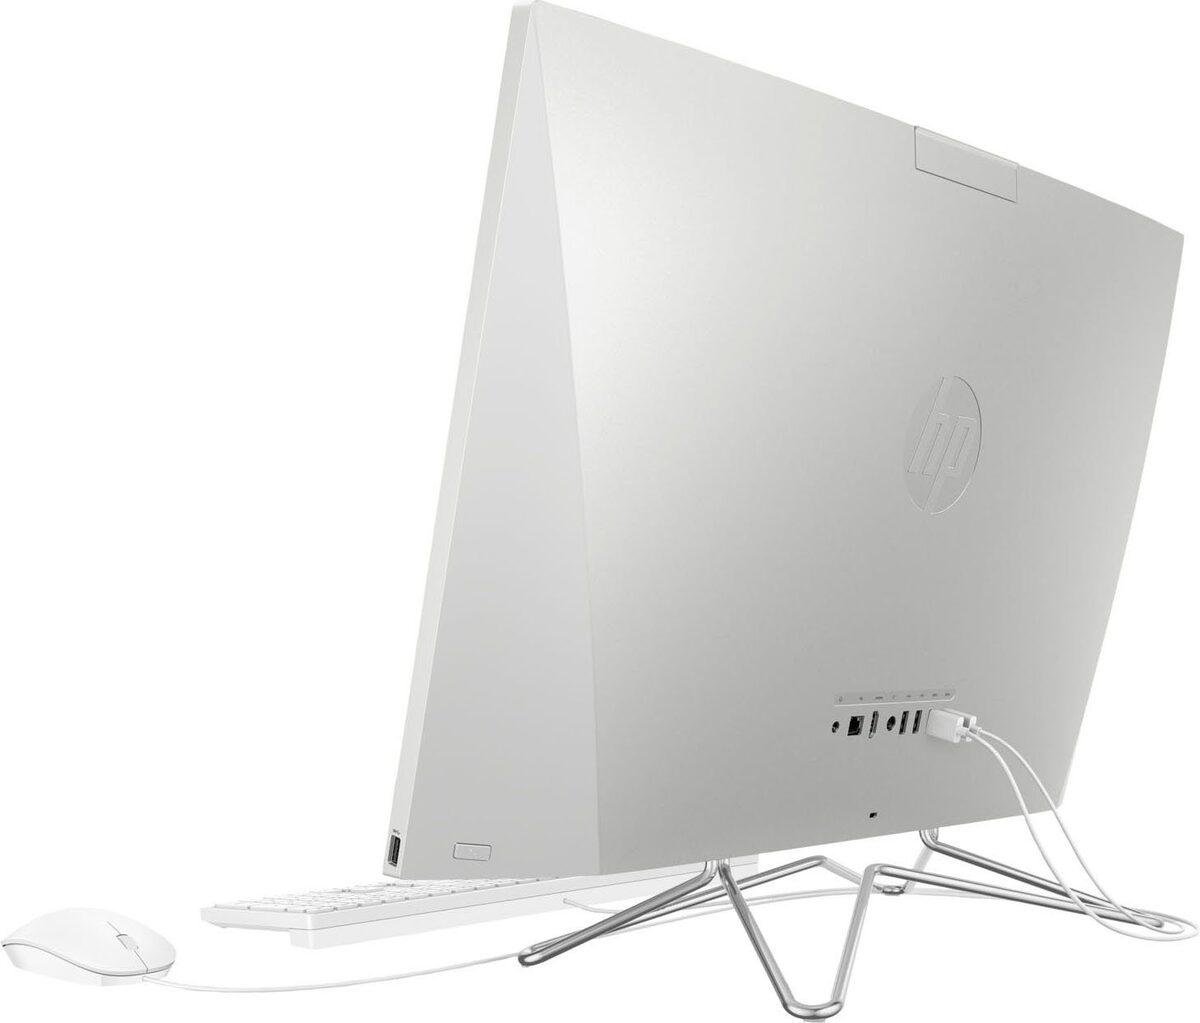 Bild 4 von HP 27-dp1201ng All-in-One PC (27 Zoll Intel® Core i7 1165G7, Iris® Xe Graphics, 8 GB RAM, 1000 GB HDD, 512 GB SSD, Luftkühlung)